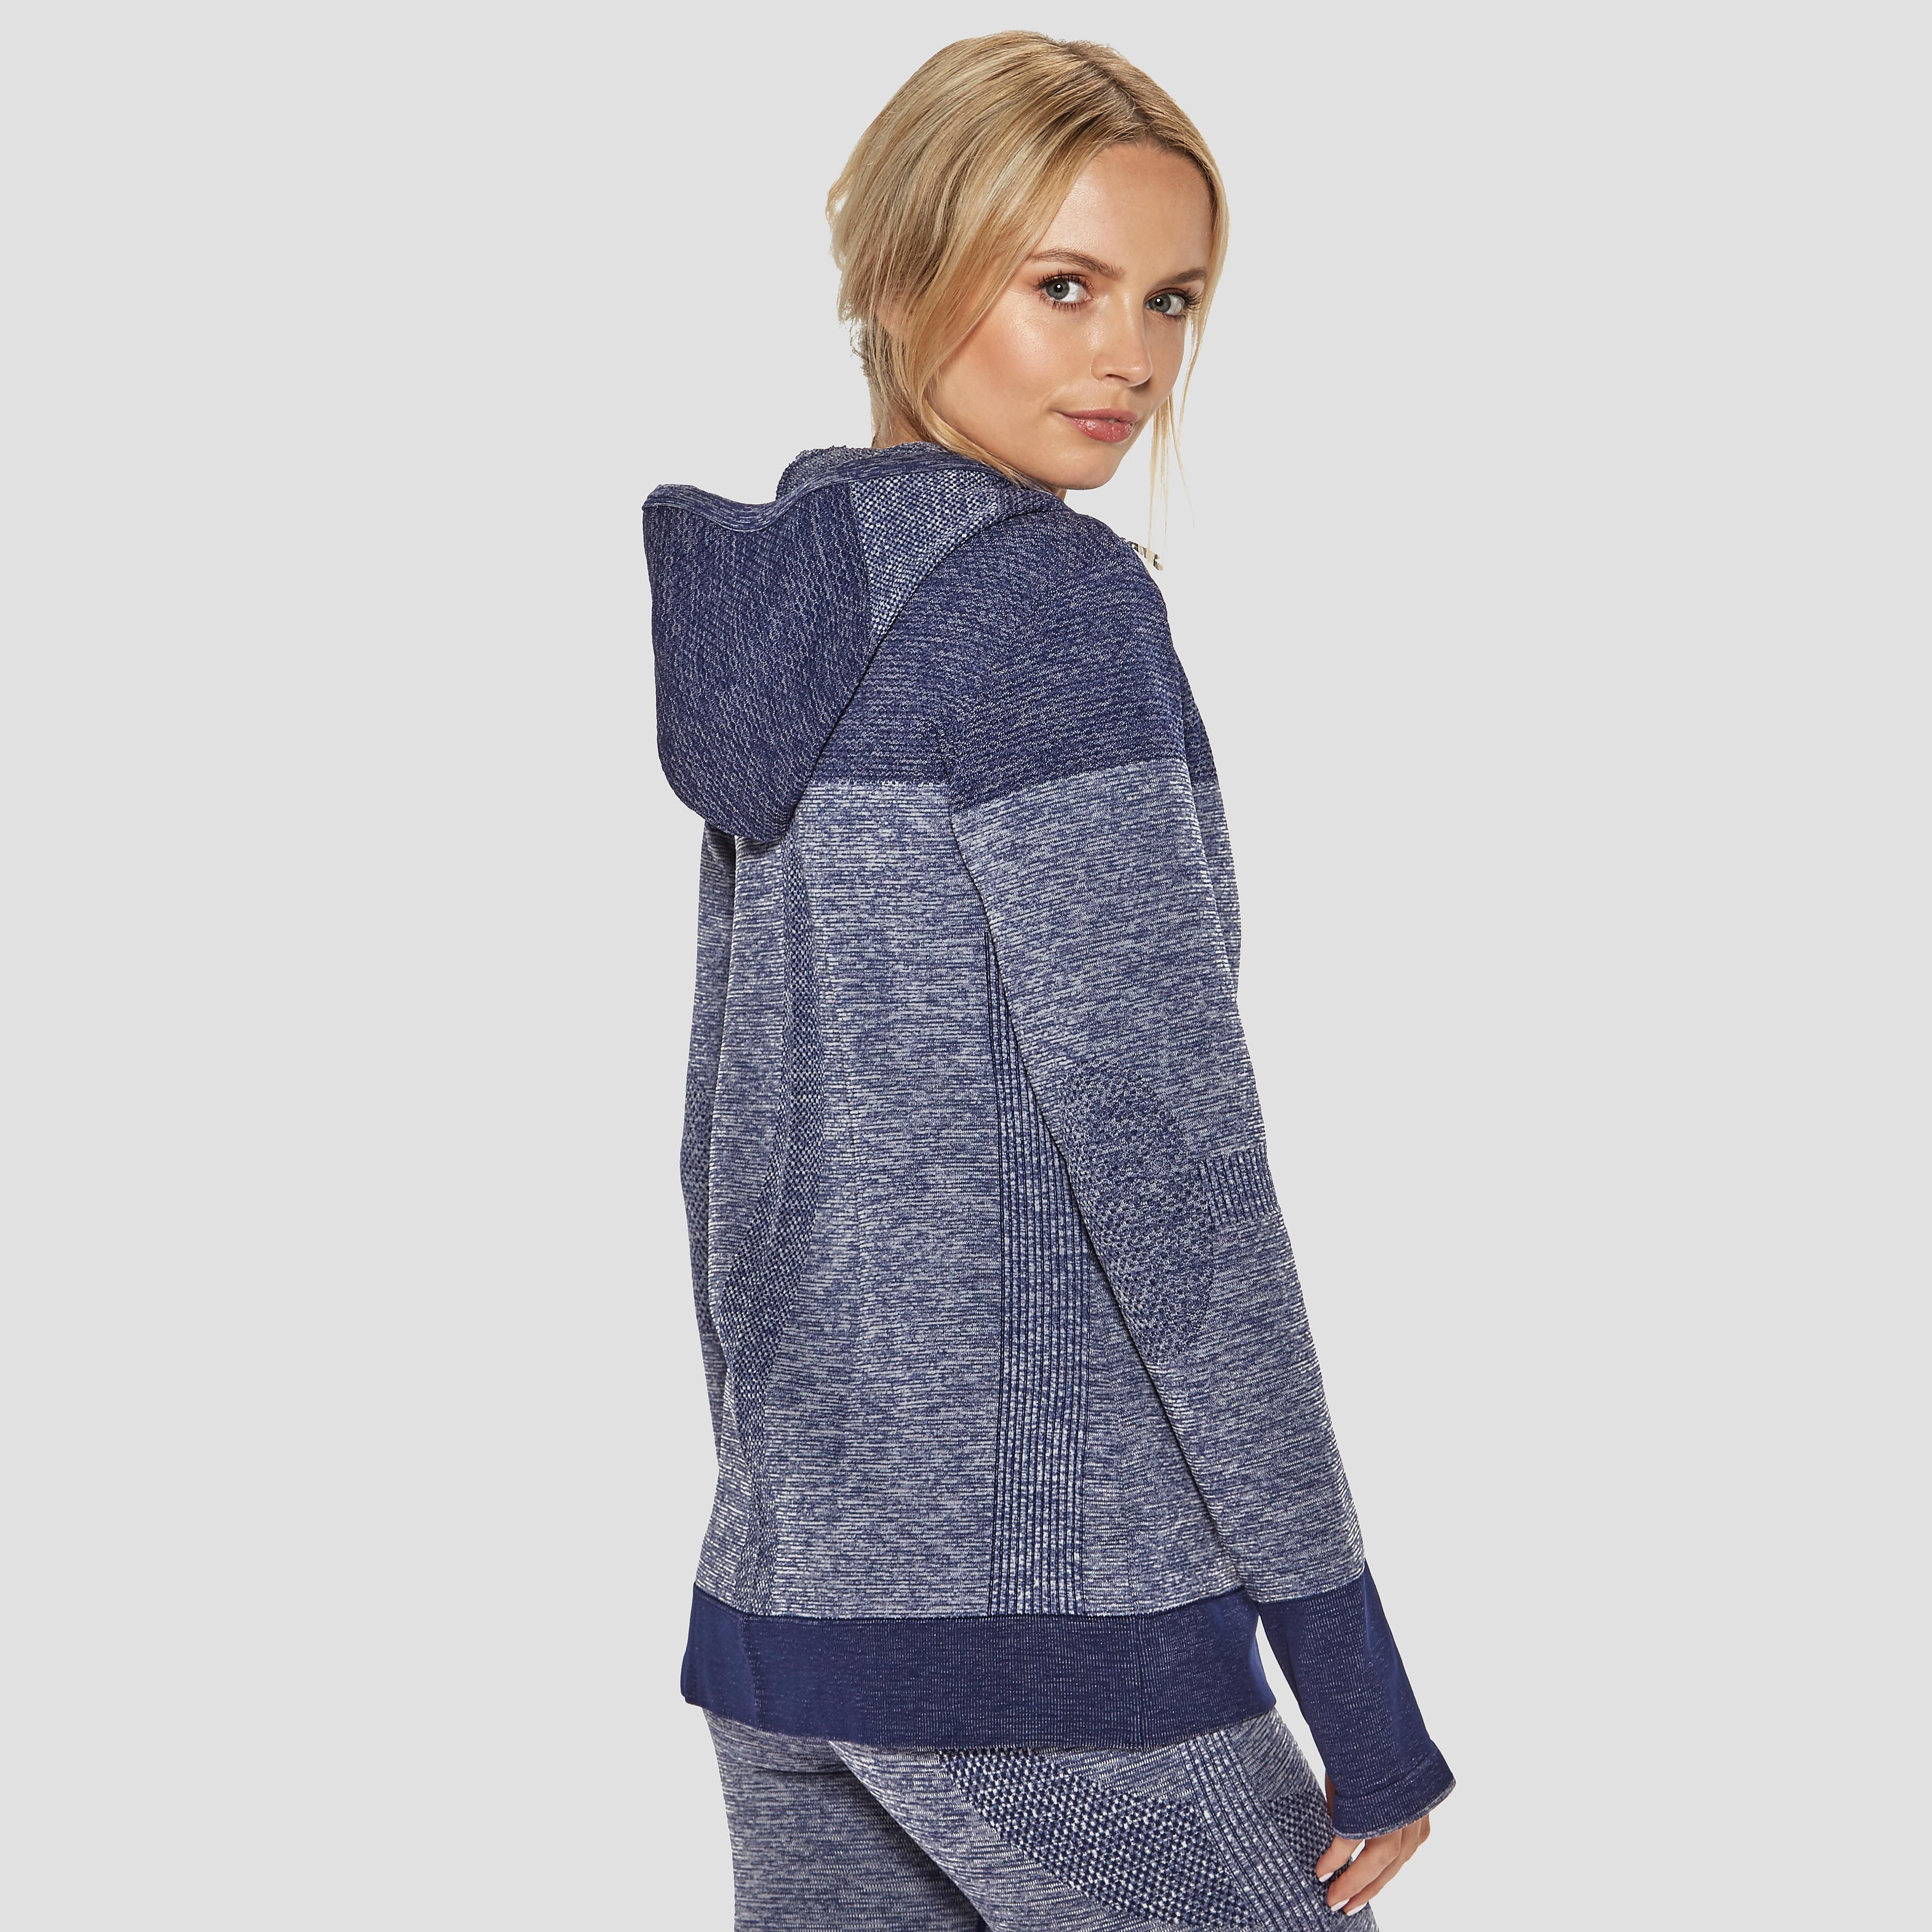 ASICS Seamless Women's Jacket